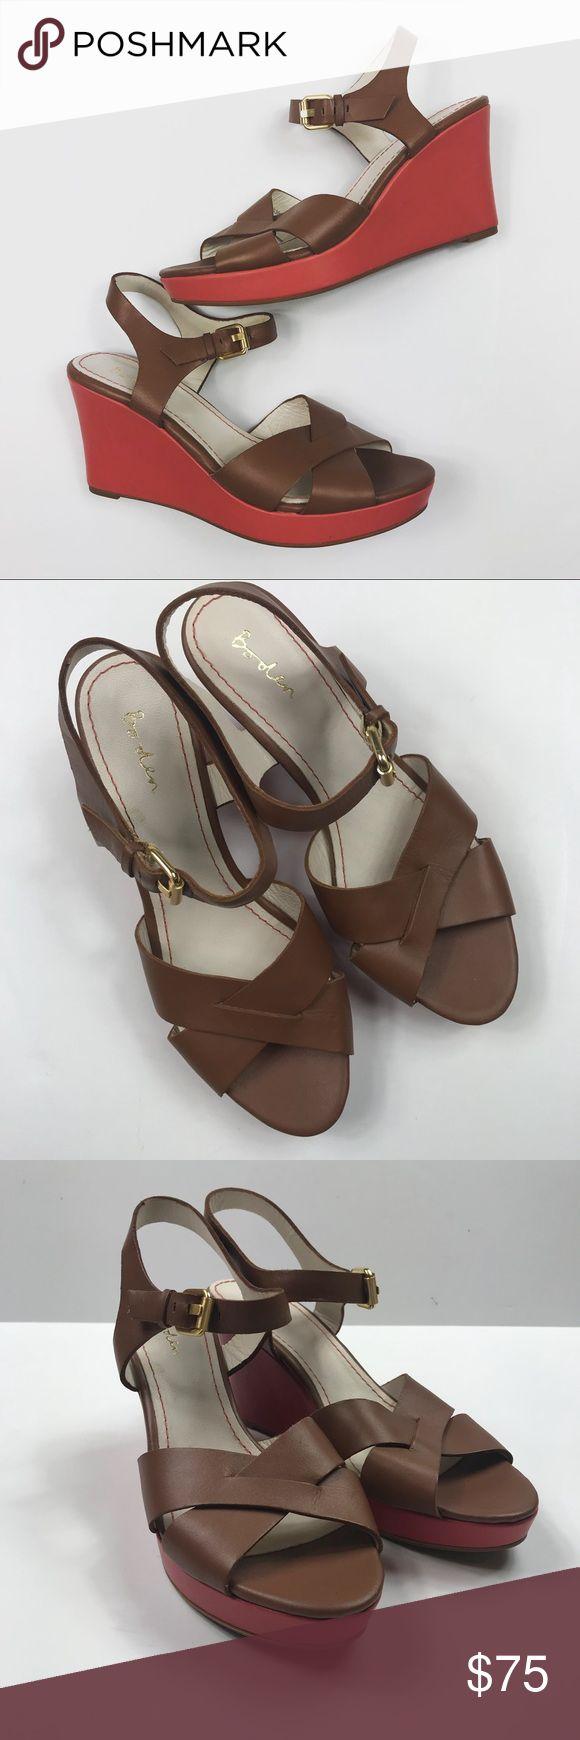 Best 25 Boden Shoes Ideas On Pinterest Boden Blue